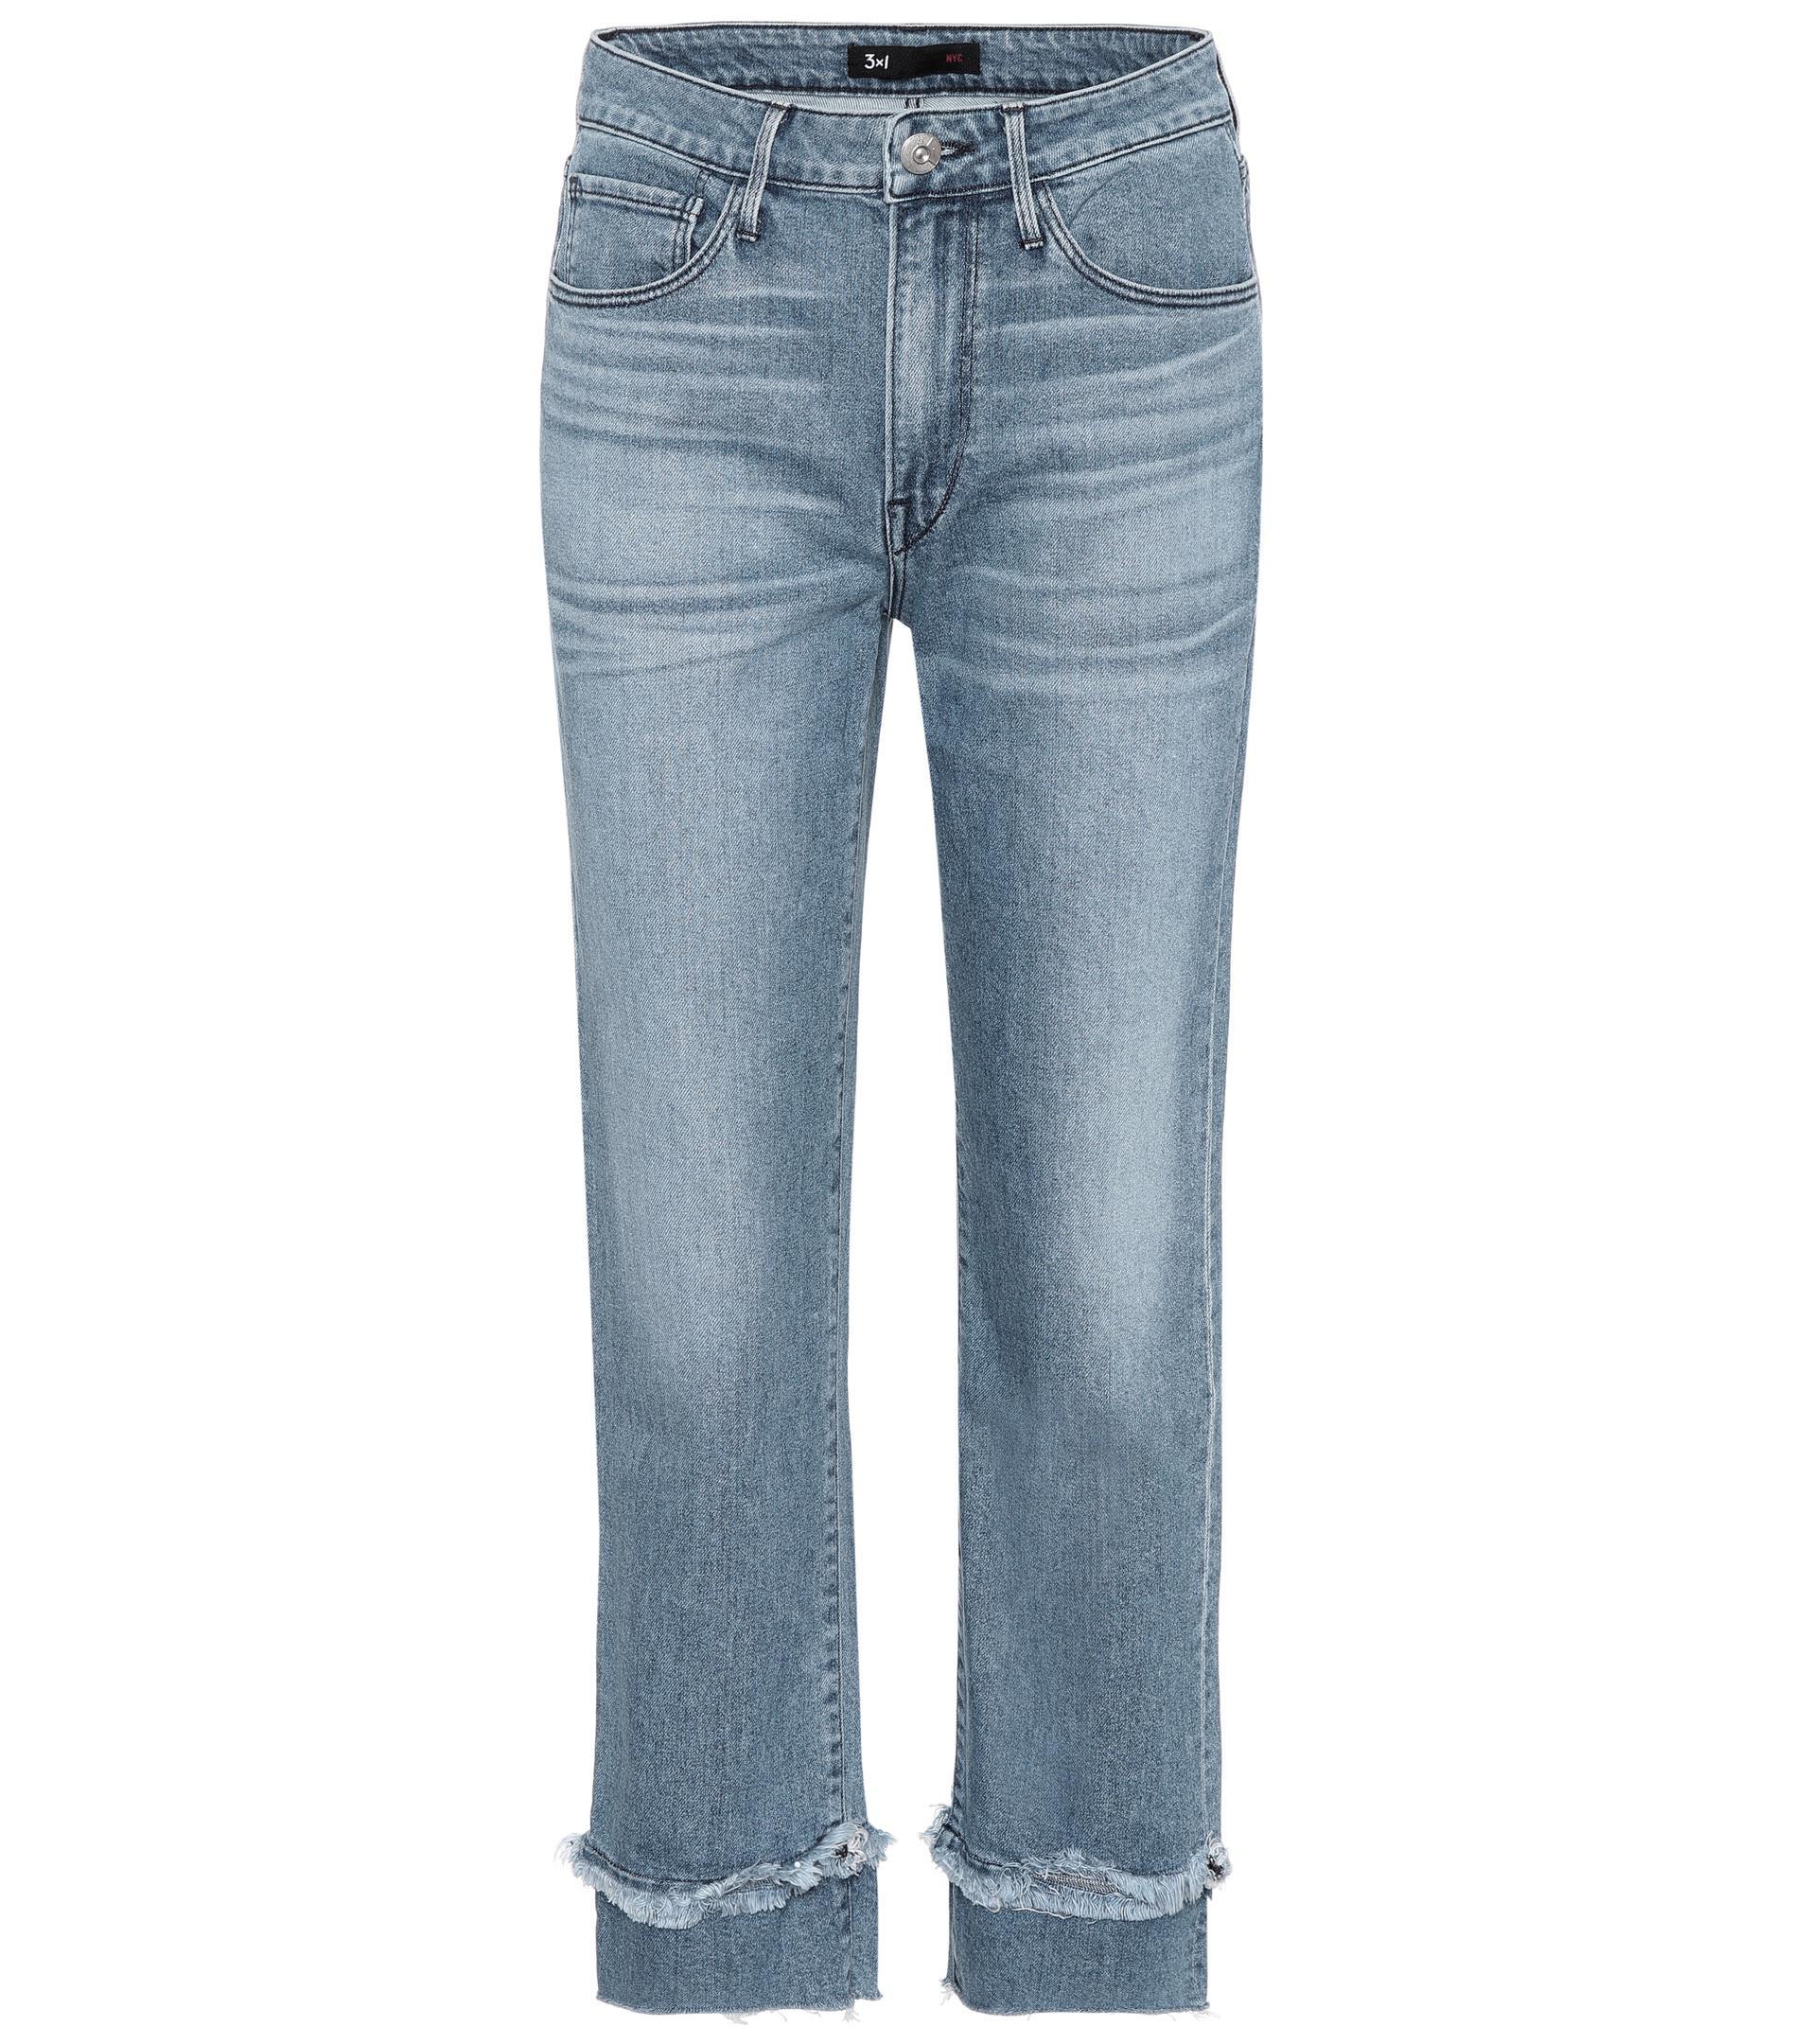 W3 Higher Ground Slim Crop jeans 3x1 brvjDO